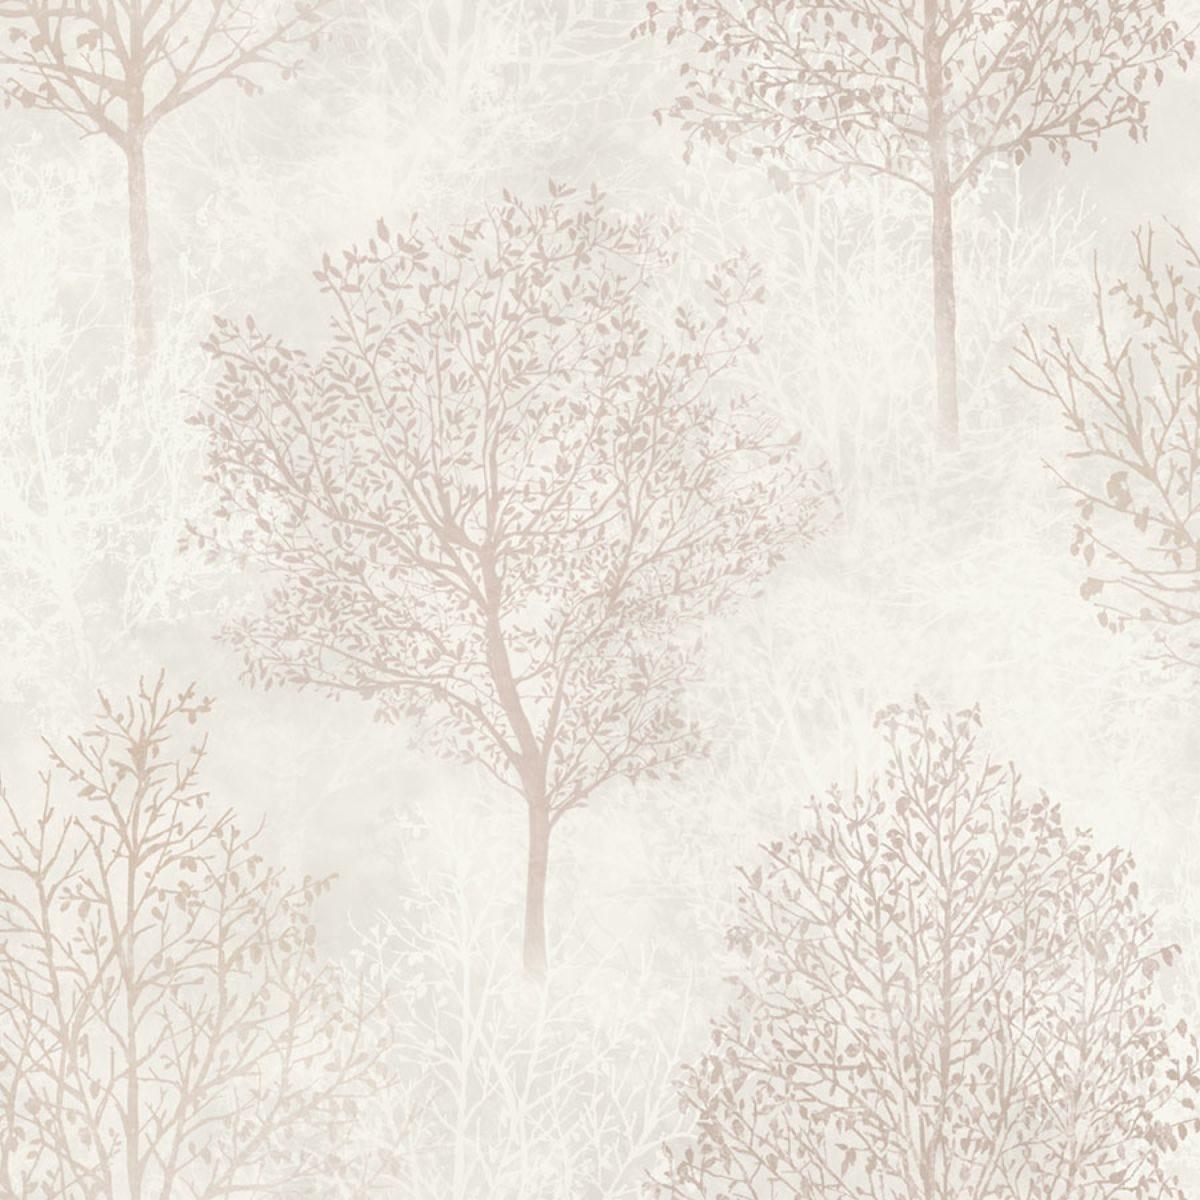 Arthouse Wonderland Trees Wallpaper – Natural